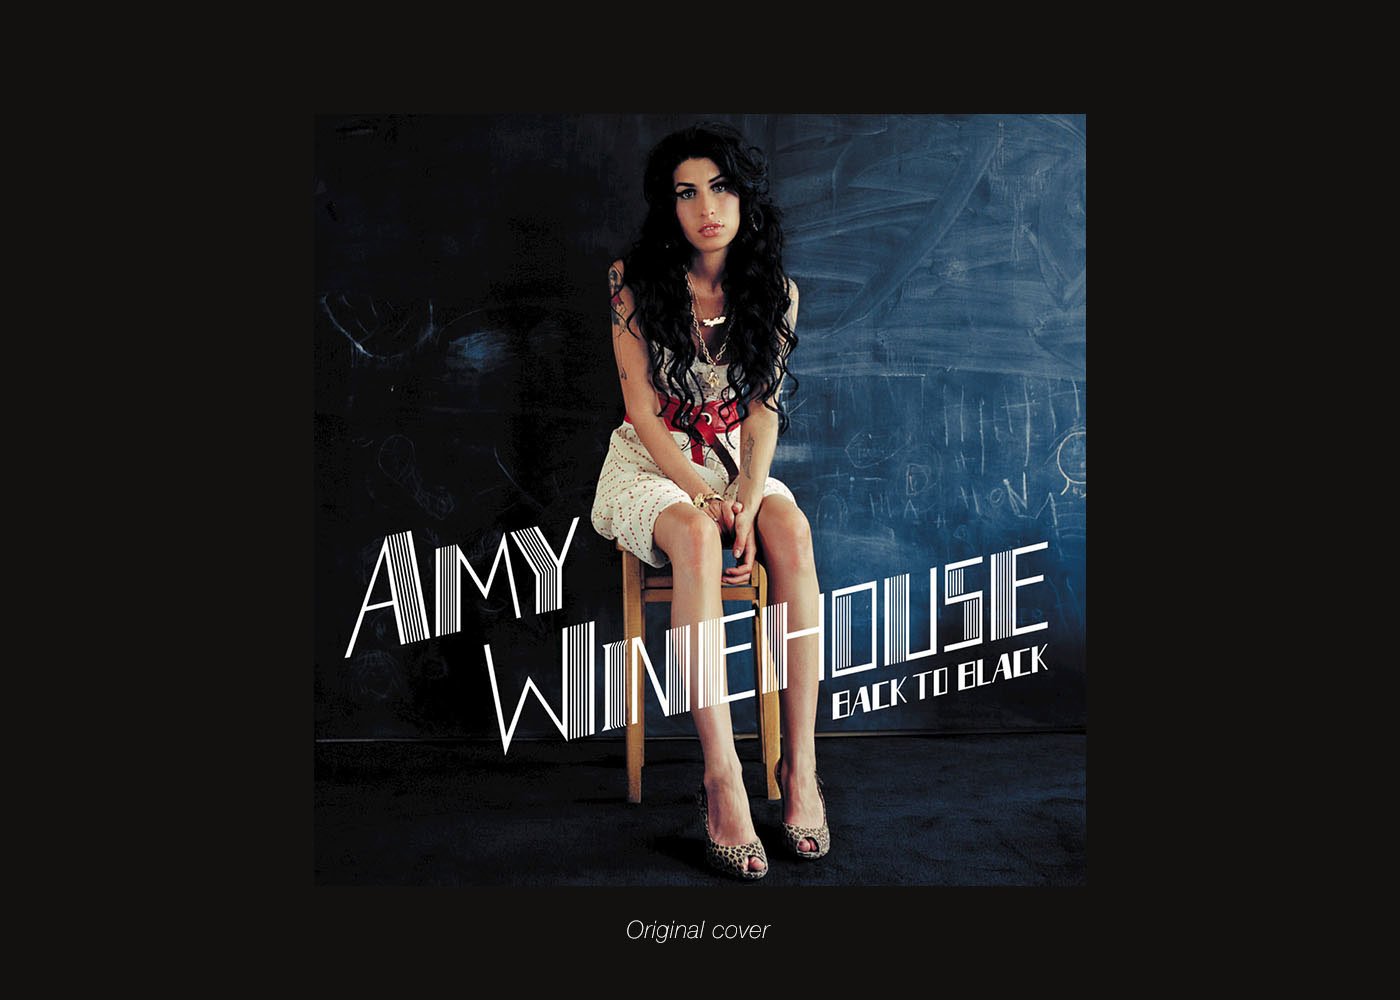 Amy winehouse cover record art deco old Retro vintage depositphotos